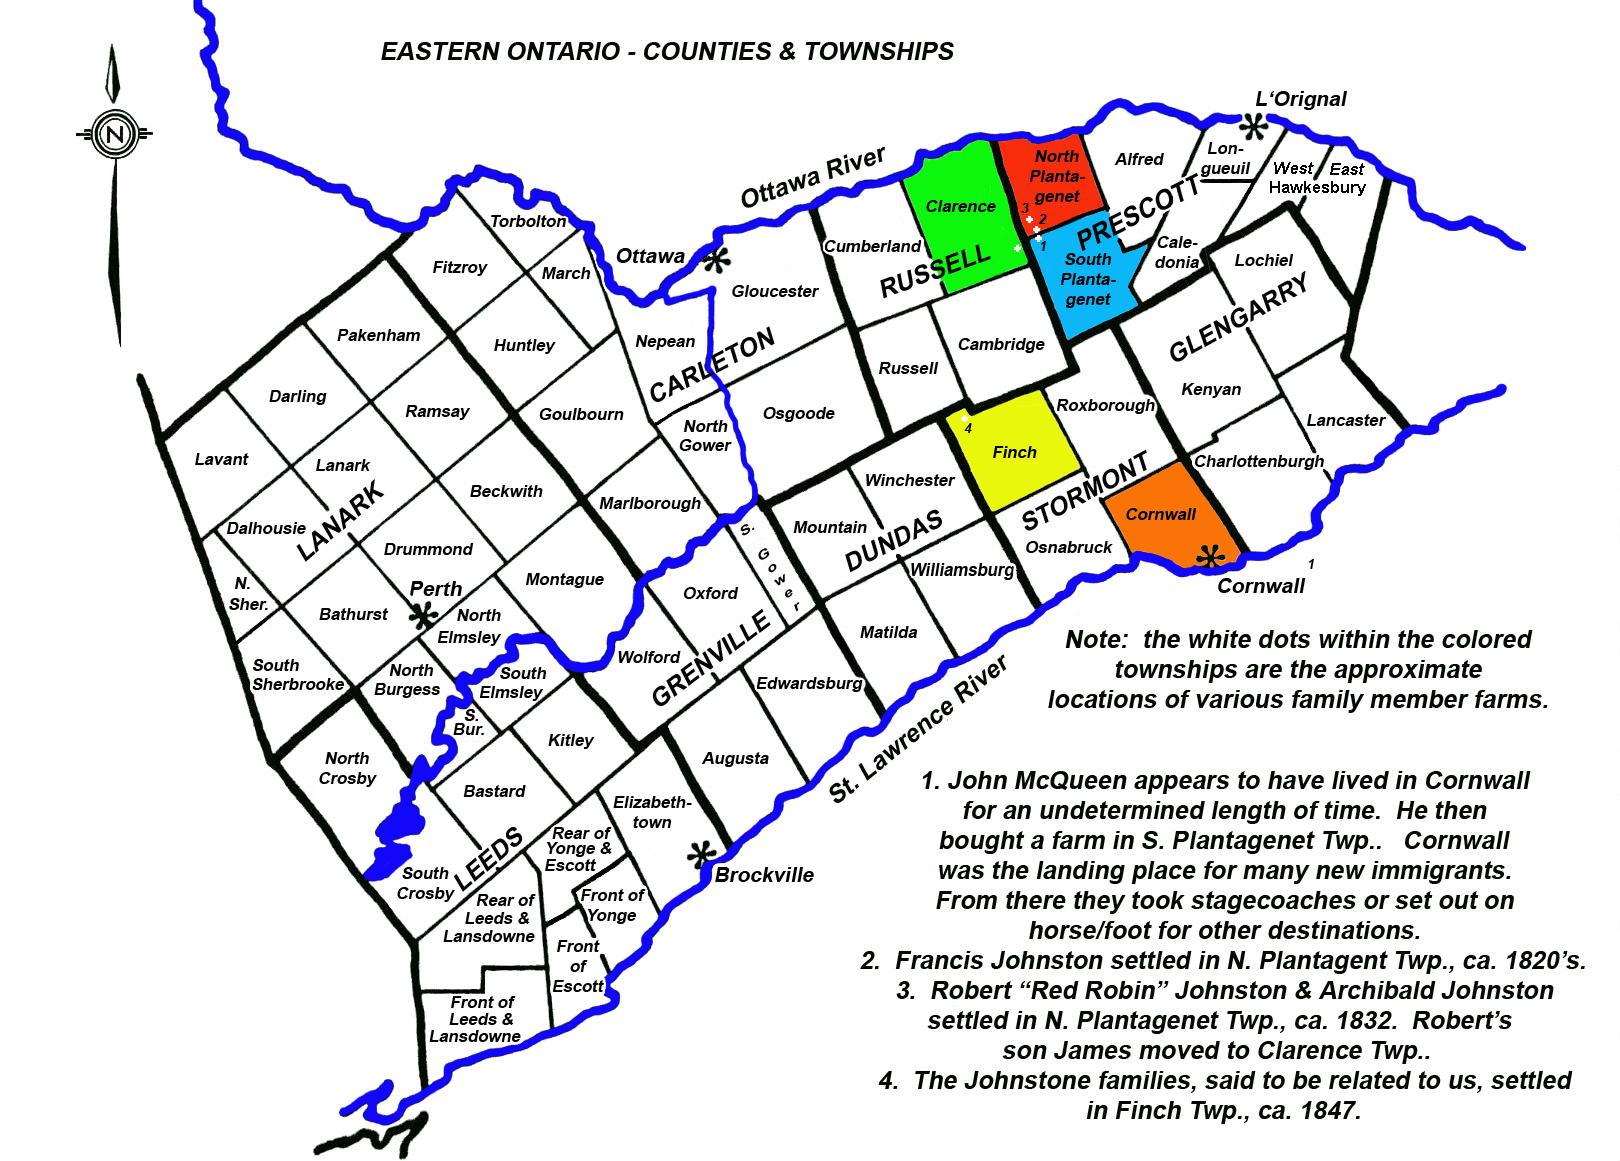 Map - Eastern Ontario Counties